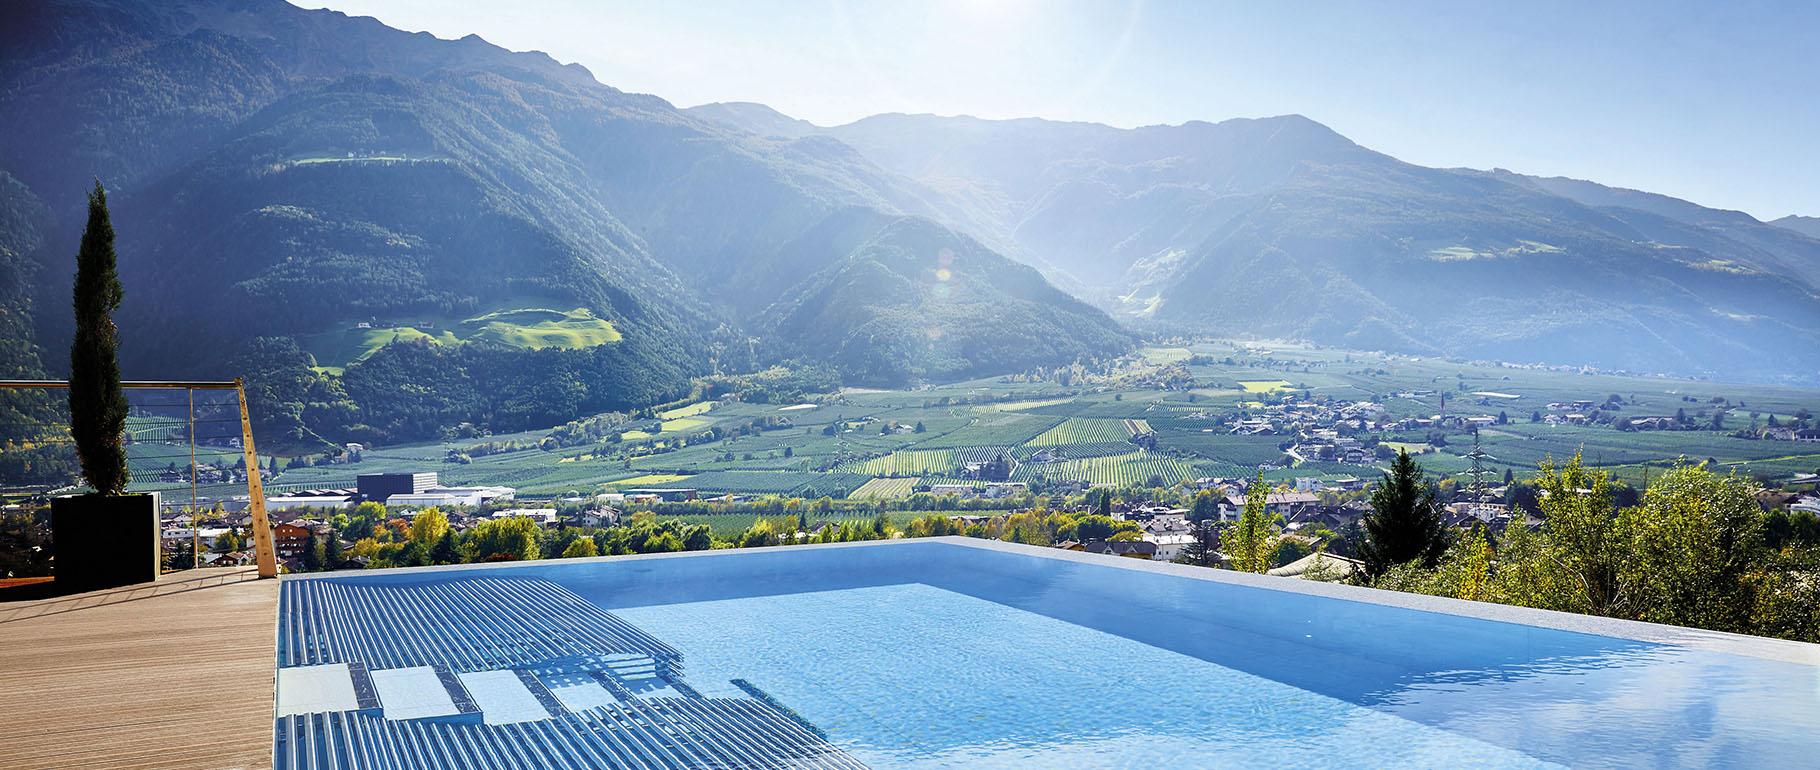 Pool Hotel Preidlhof